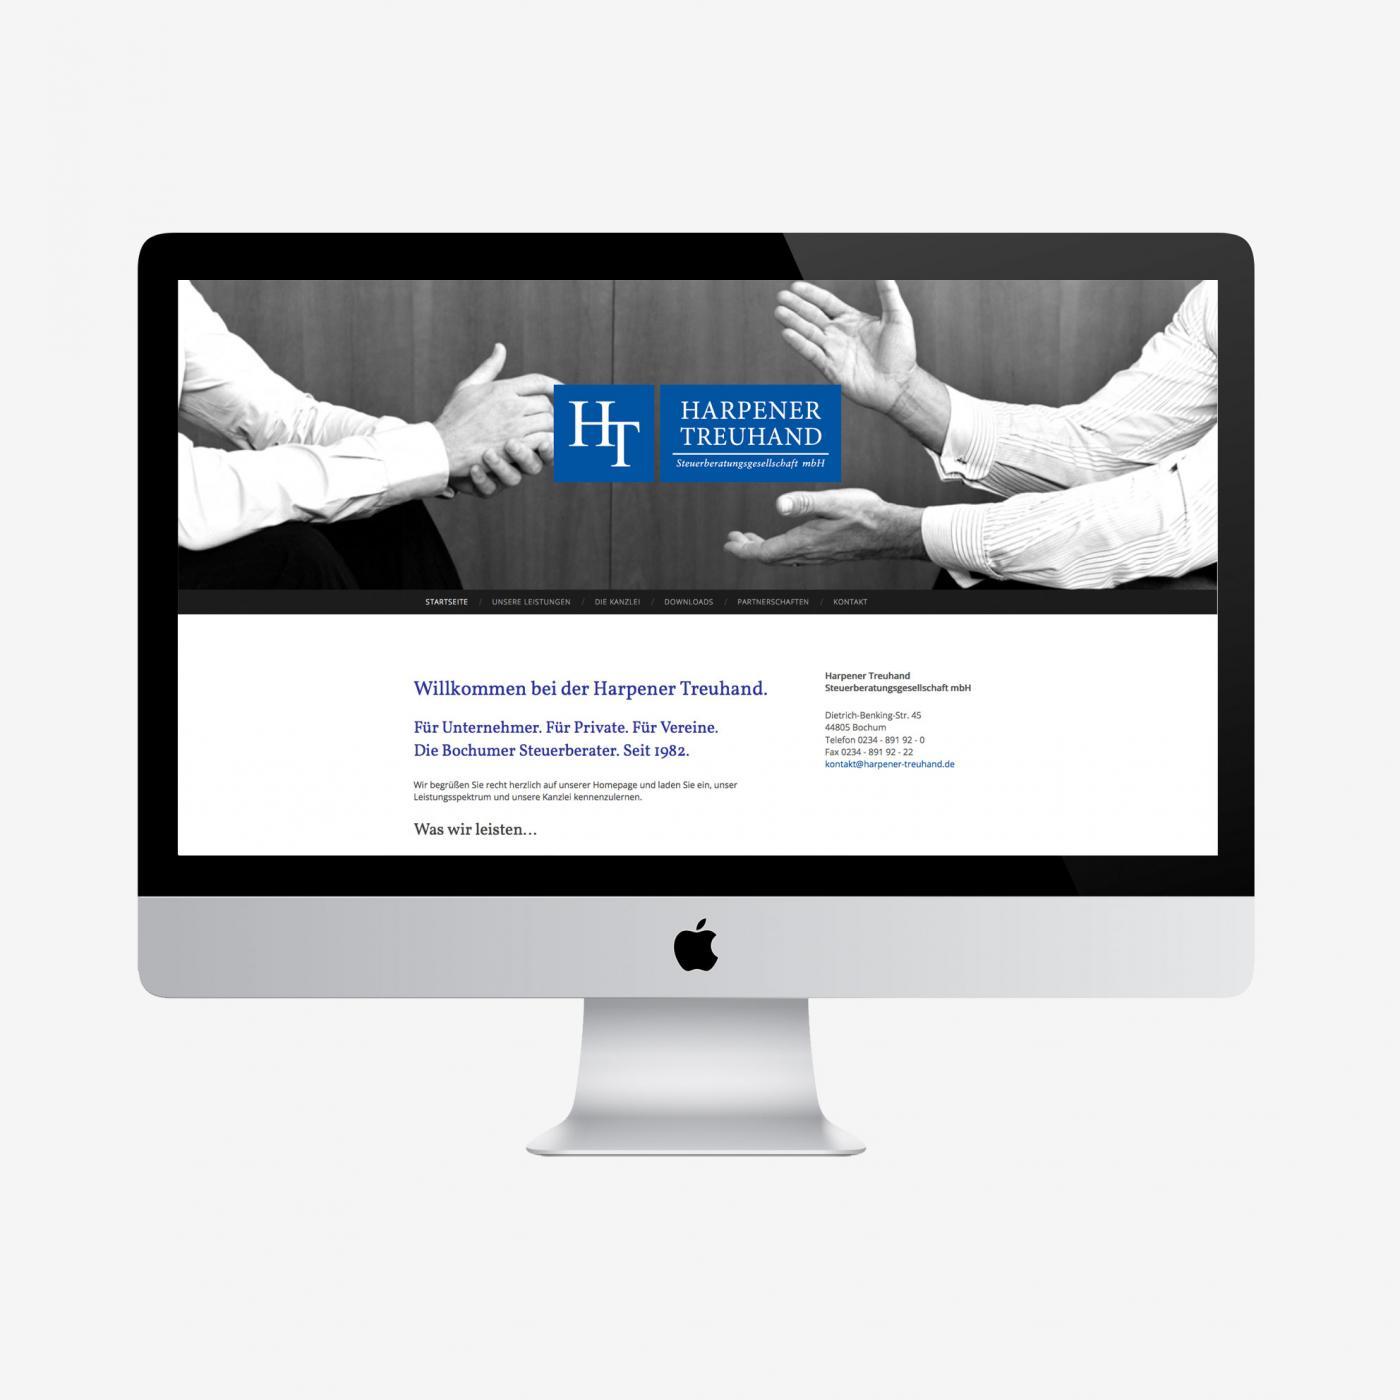 werbeagentur-gronewald-berlin-steuerberatung-webdesign